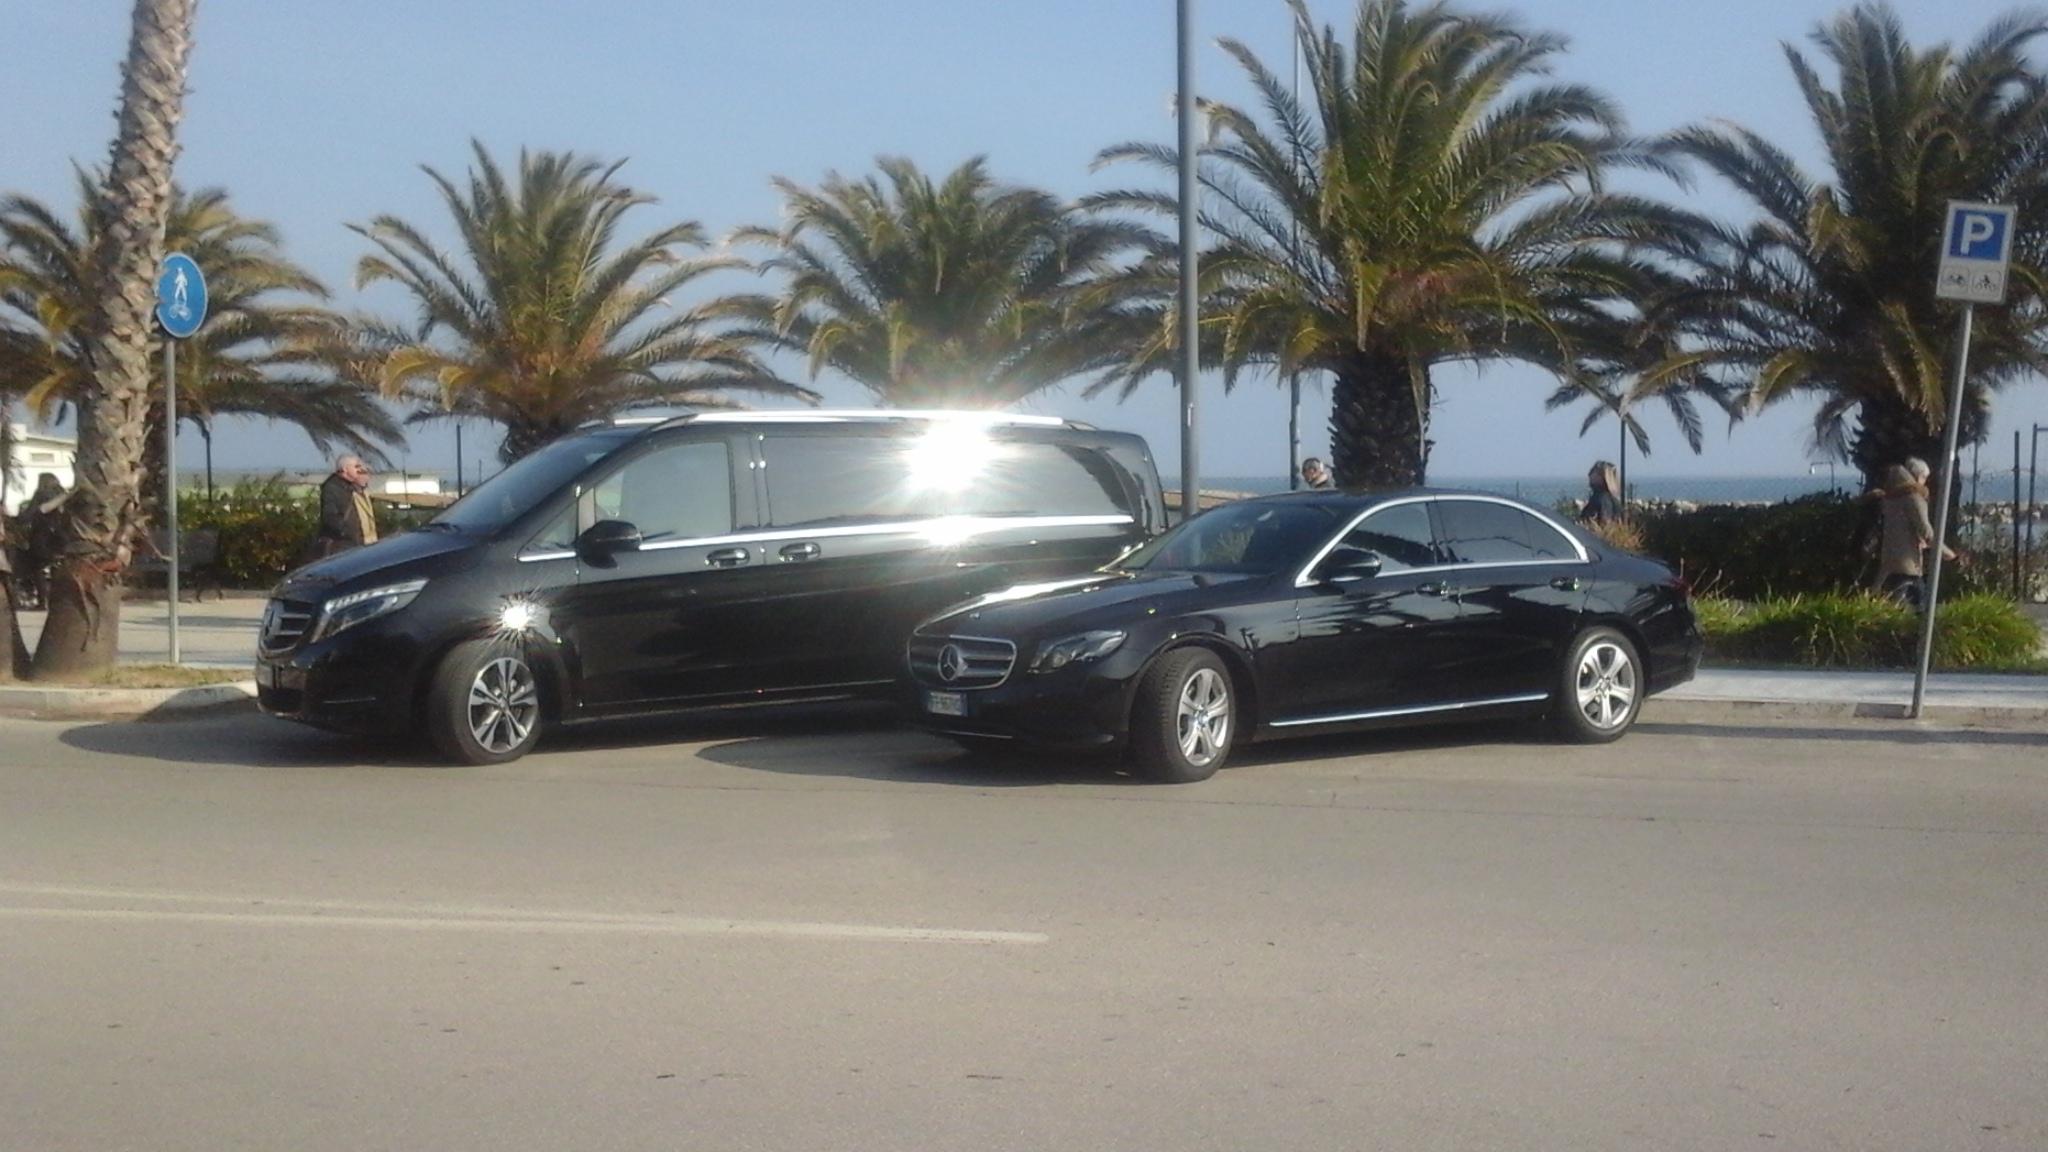 Euro Full Service Autonoleggio noleggio con conducente